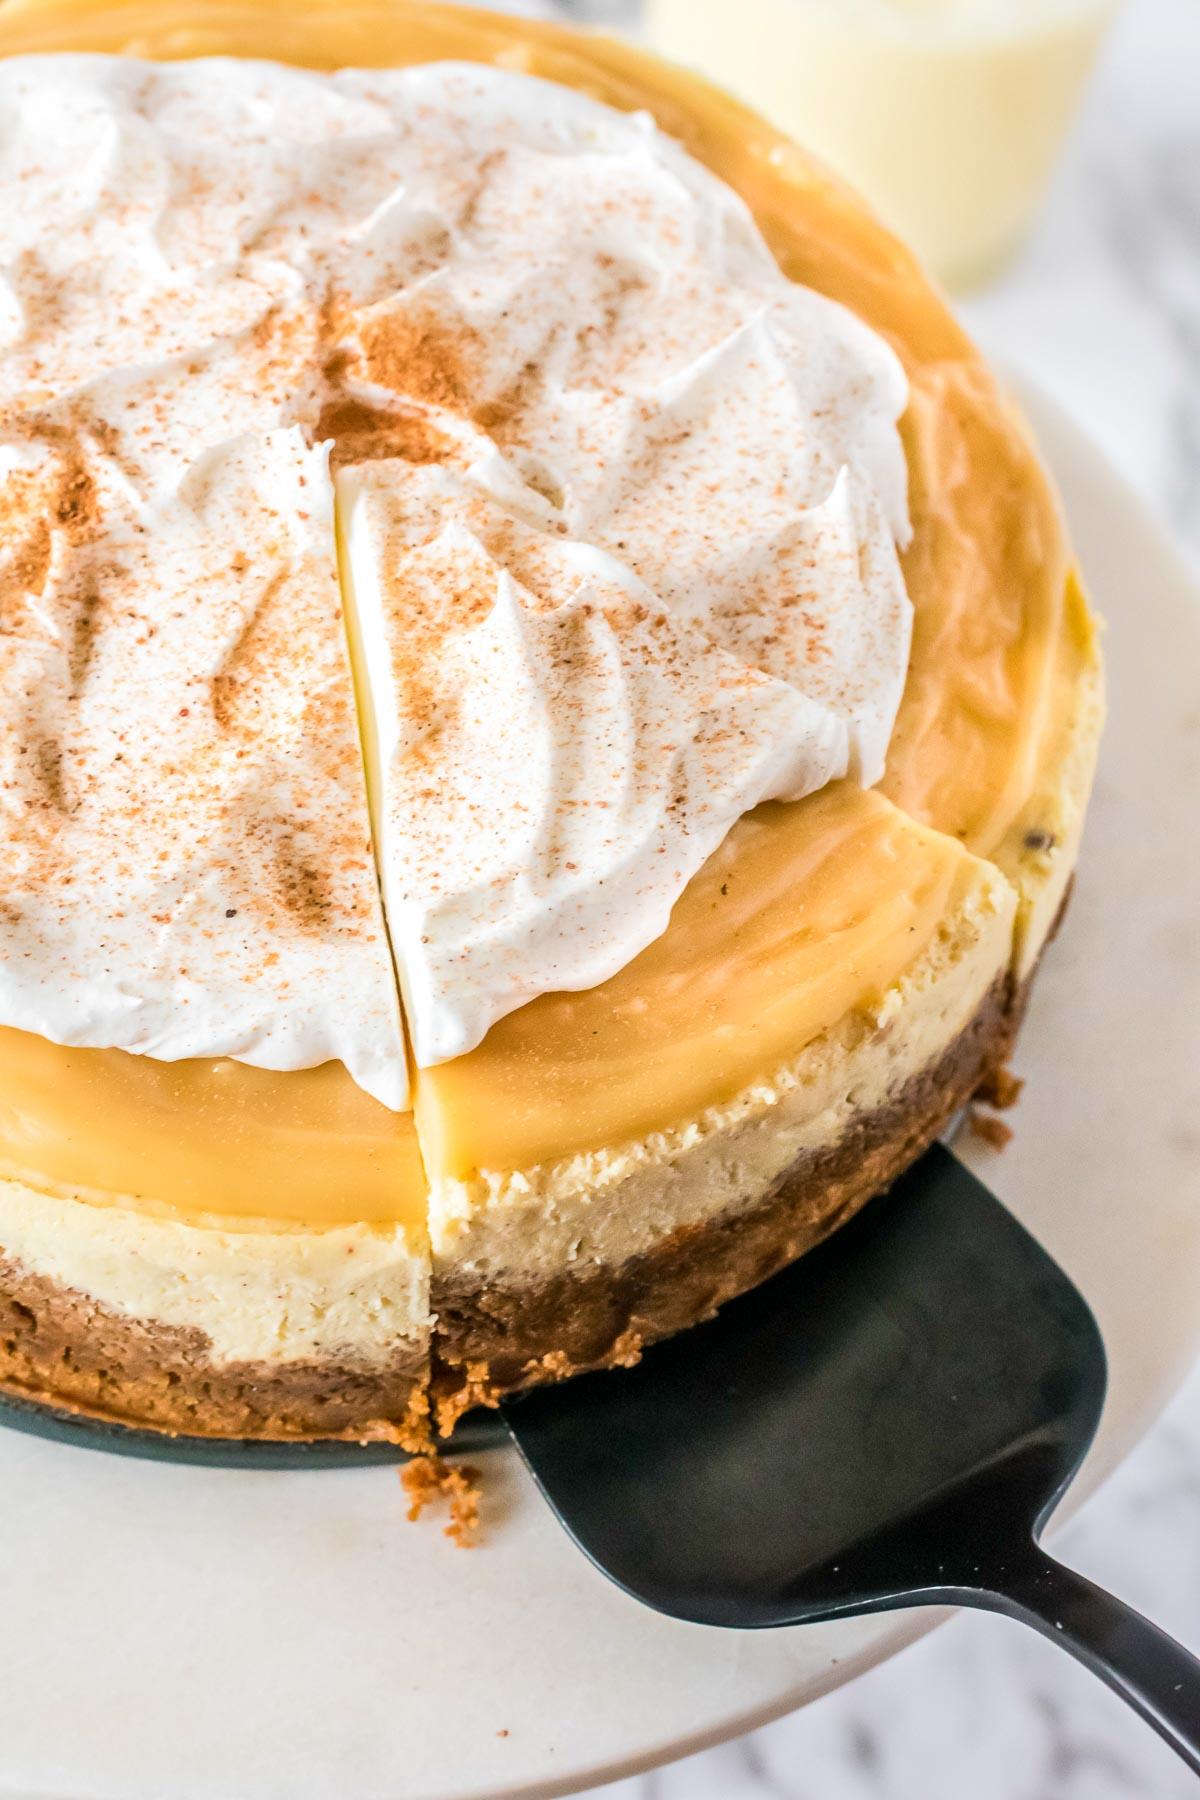 eggnog cheesecake slice on cake server